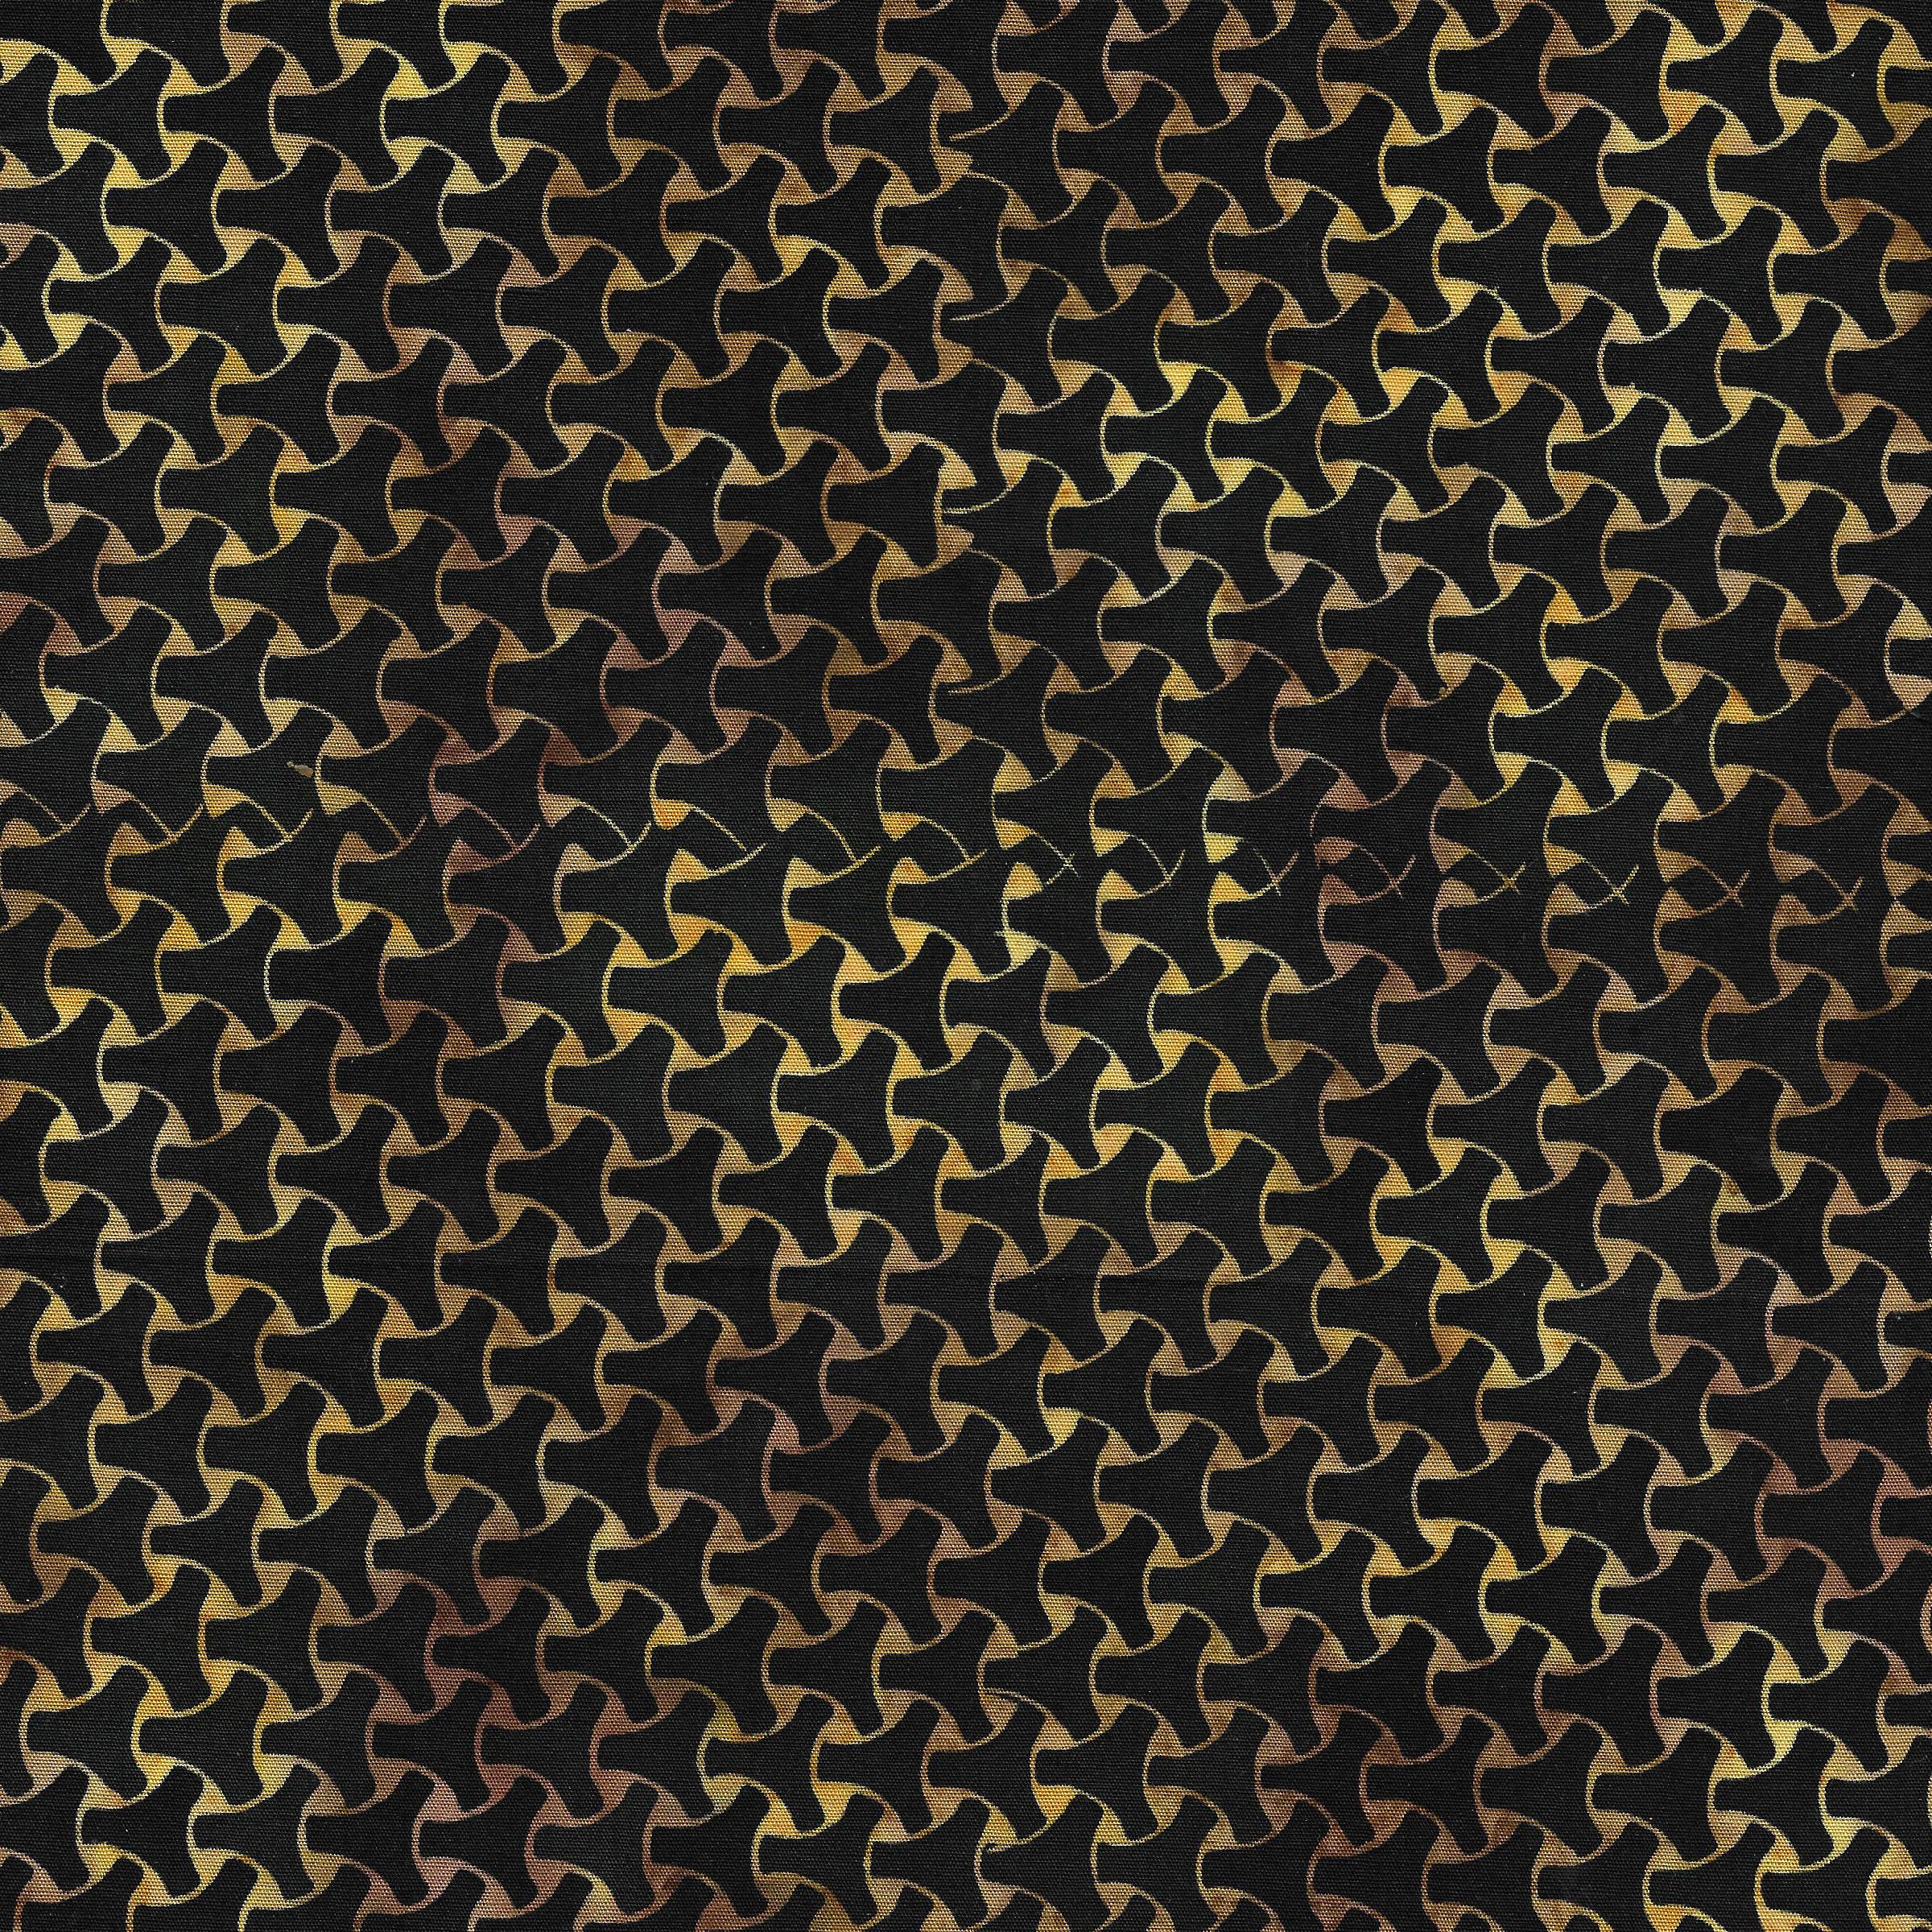 Island Batik 111922038 Knobs-Hay